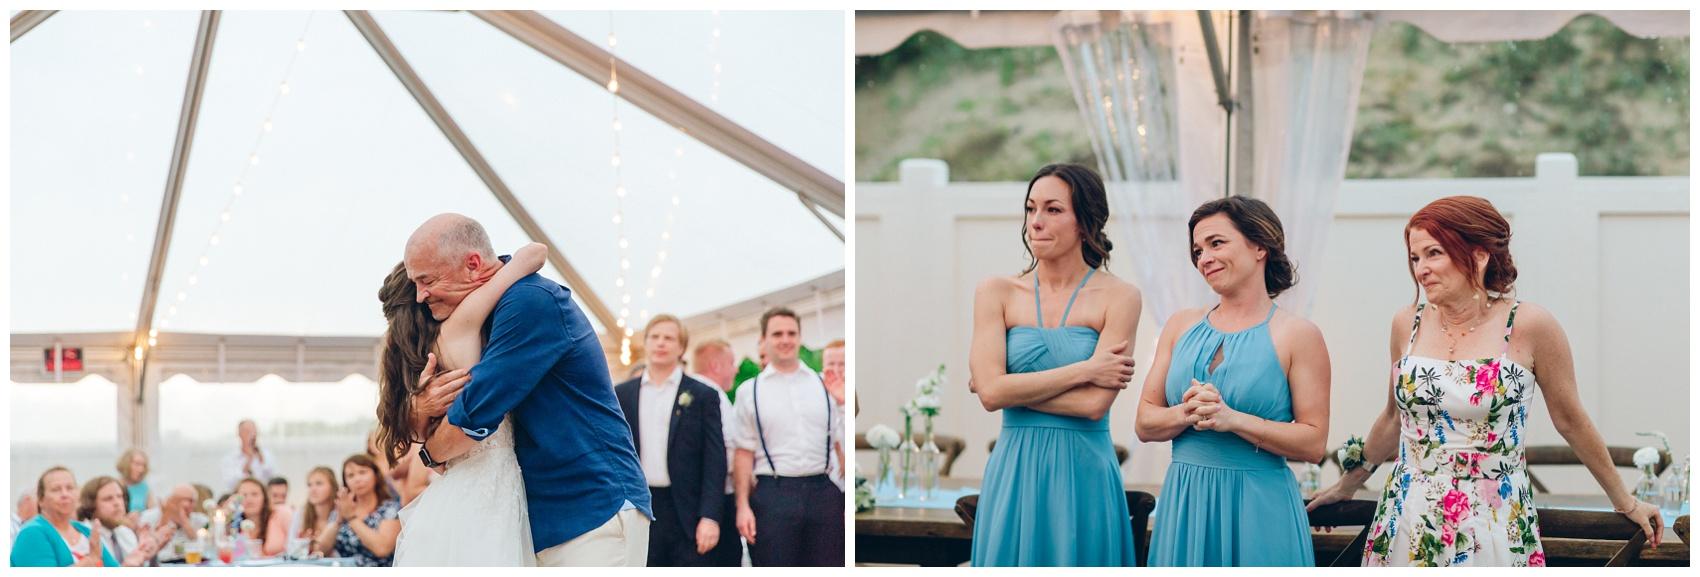 Outer-Banks-Corolla-Wedding_0111.jpg